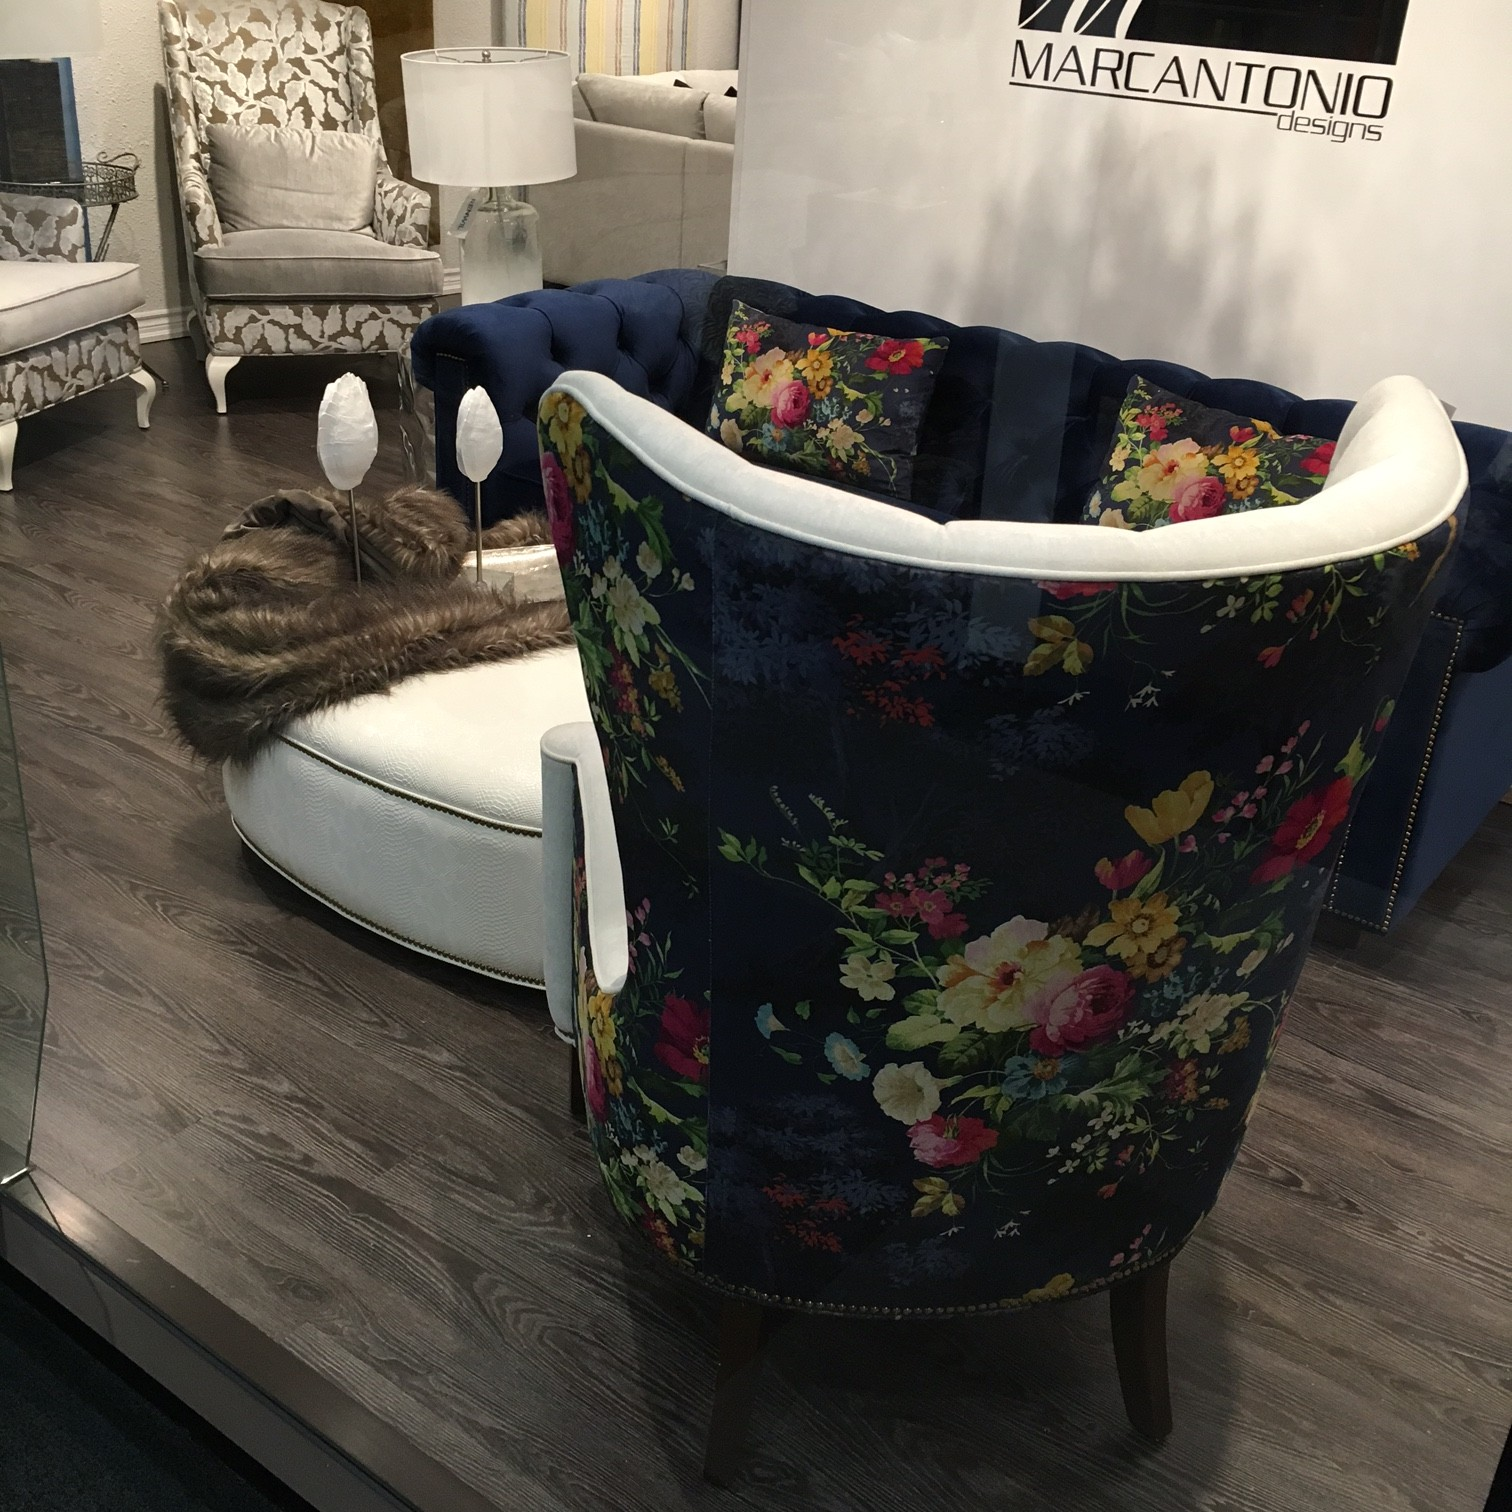 Canadian Home Decor Stores: Polanco Furniture Store Ottawa